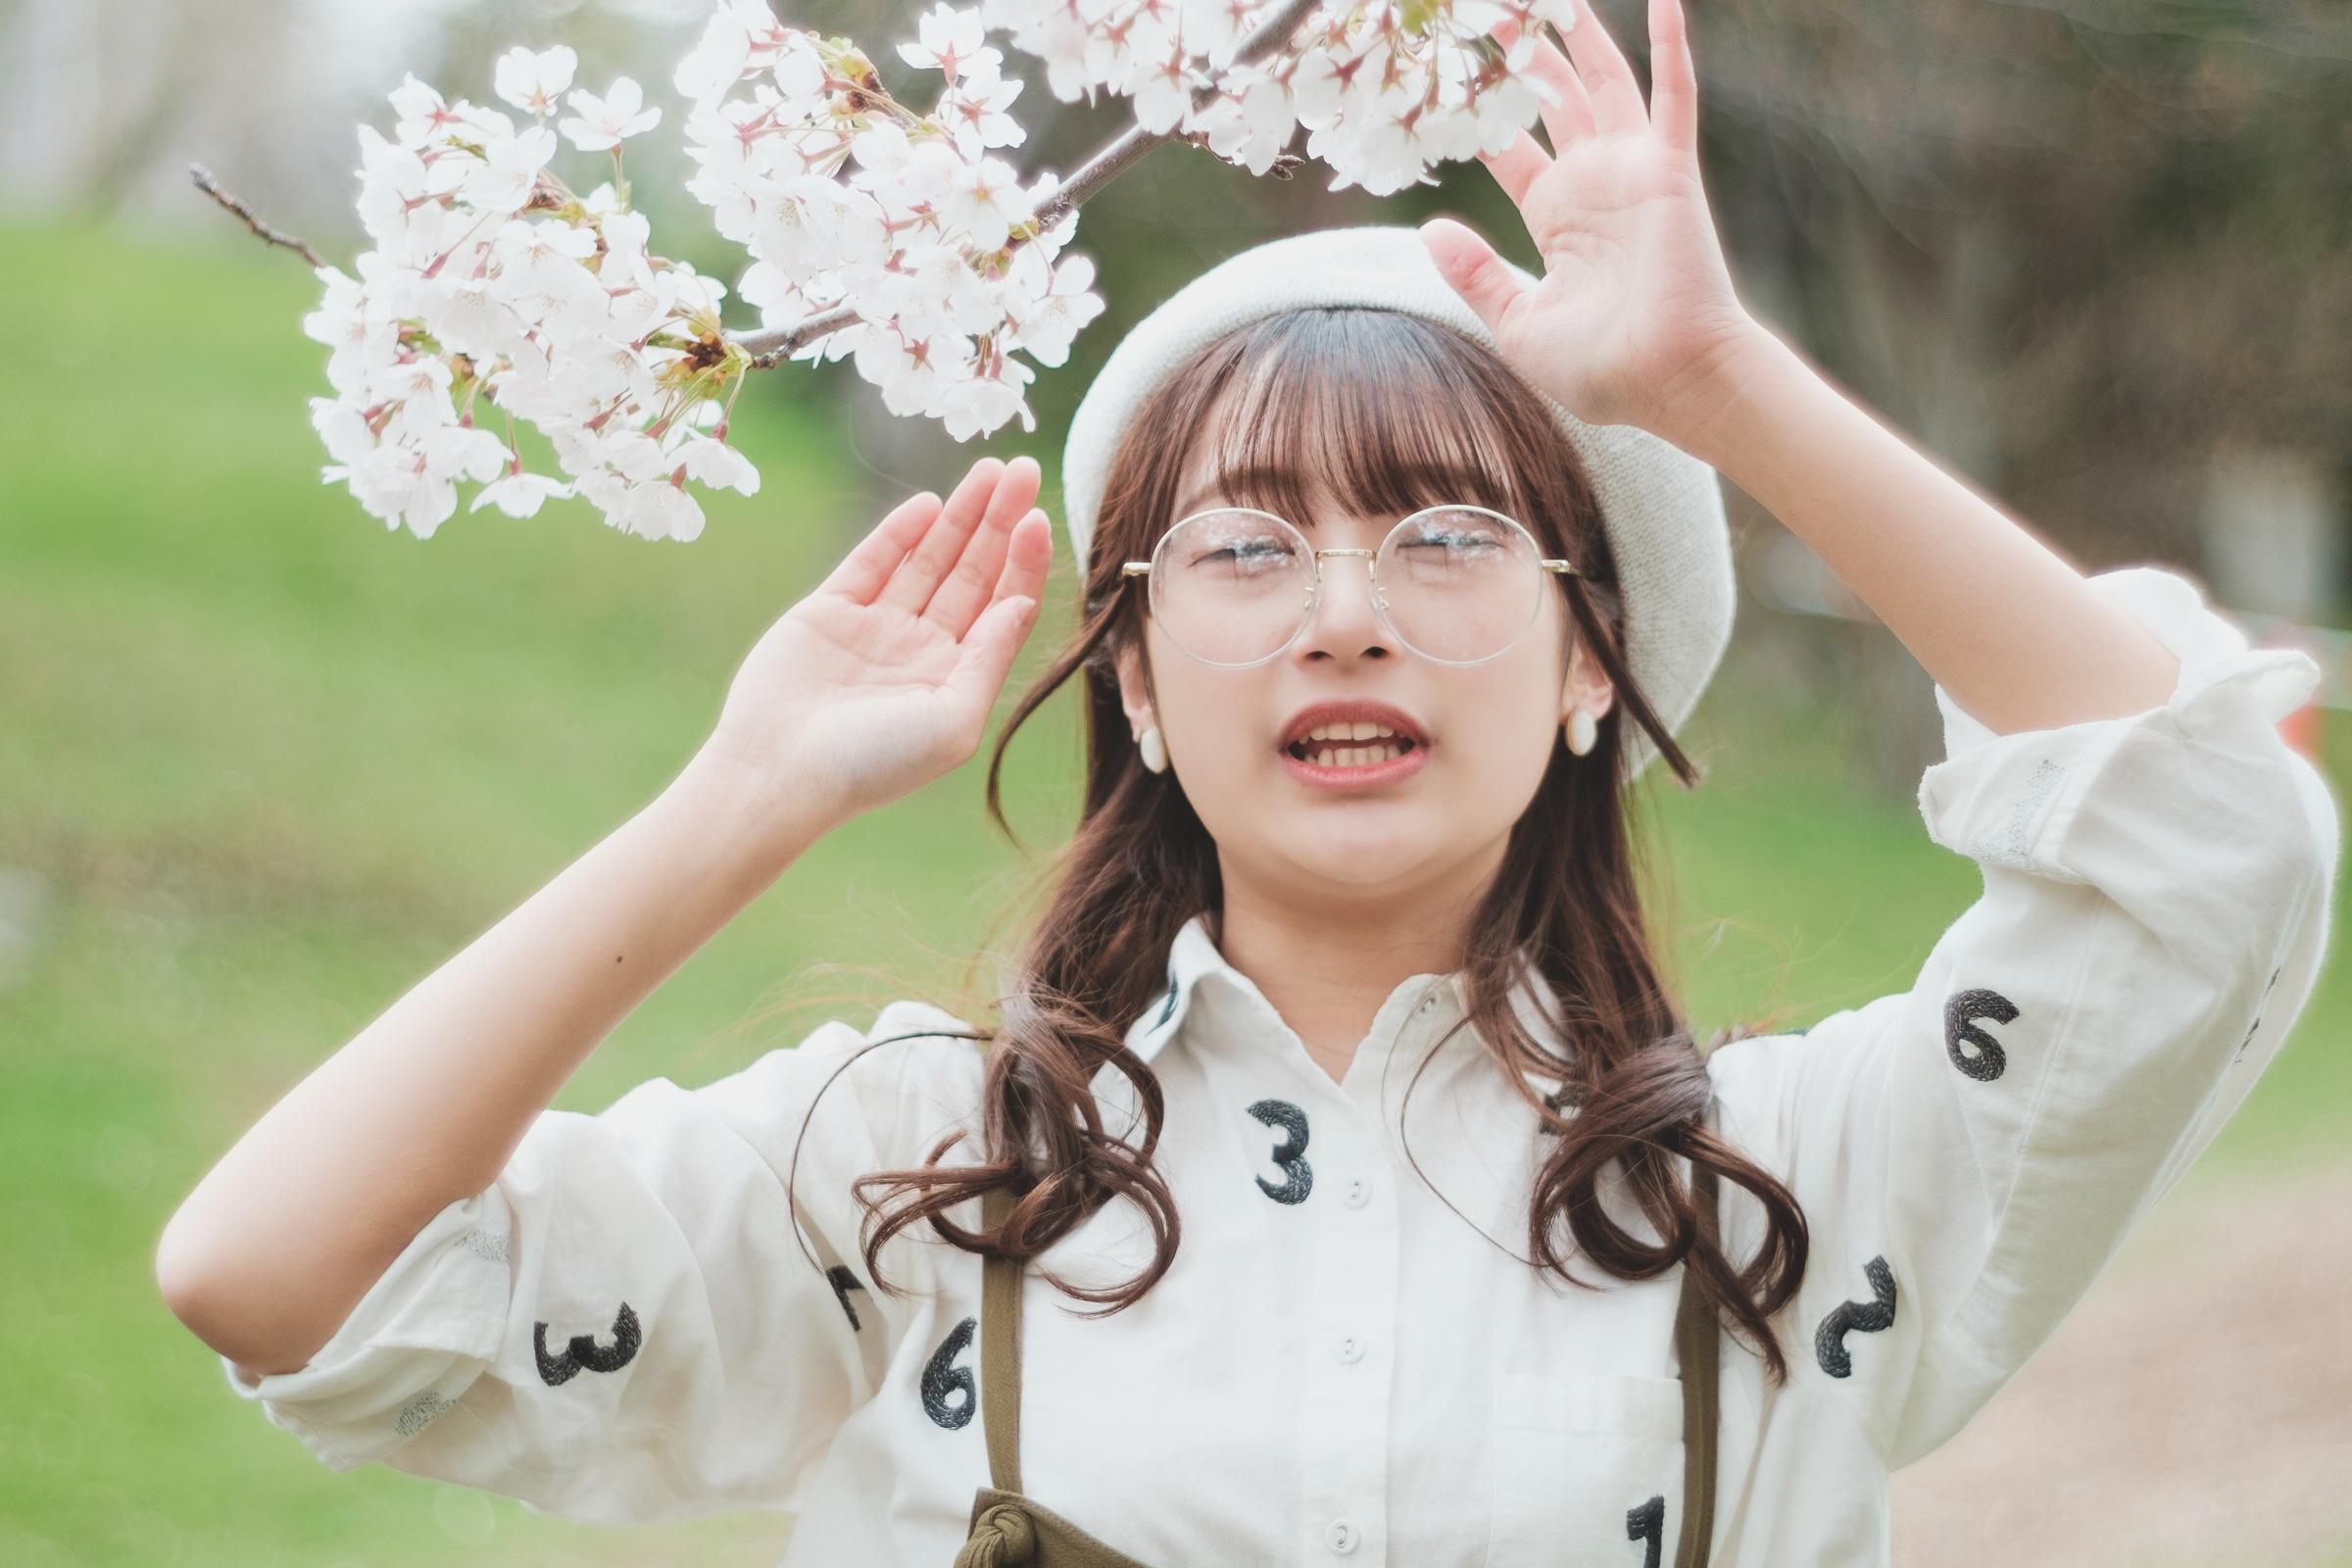 HAPPY少女♪ ちひろ ( 孫田ちひろ ) | SMP 札幌モデルプロ「桜」撮影会 at 中島公園